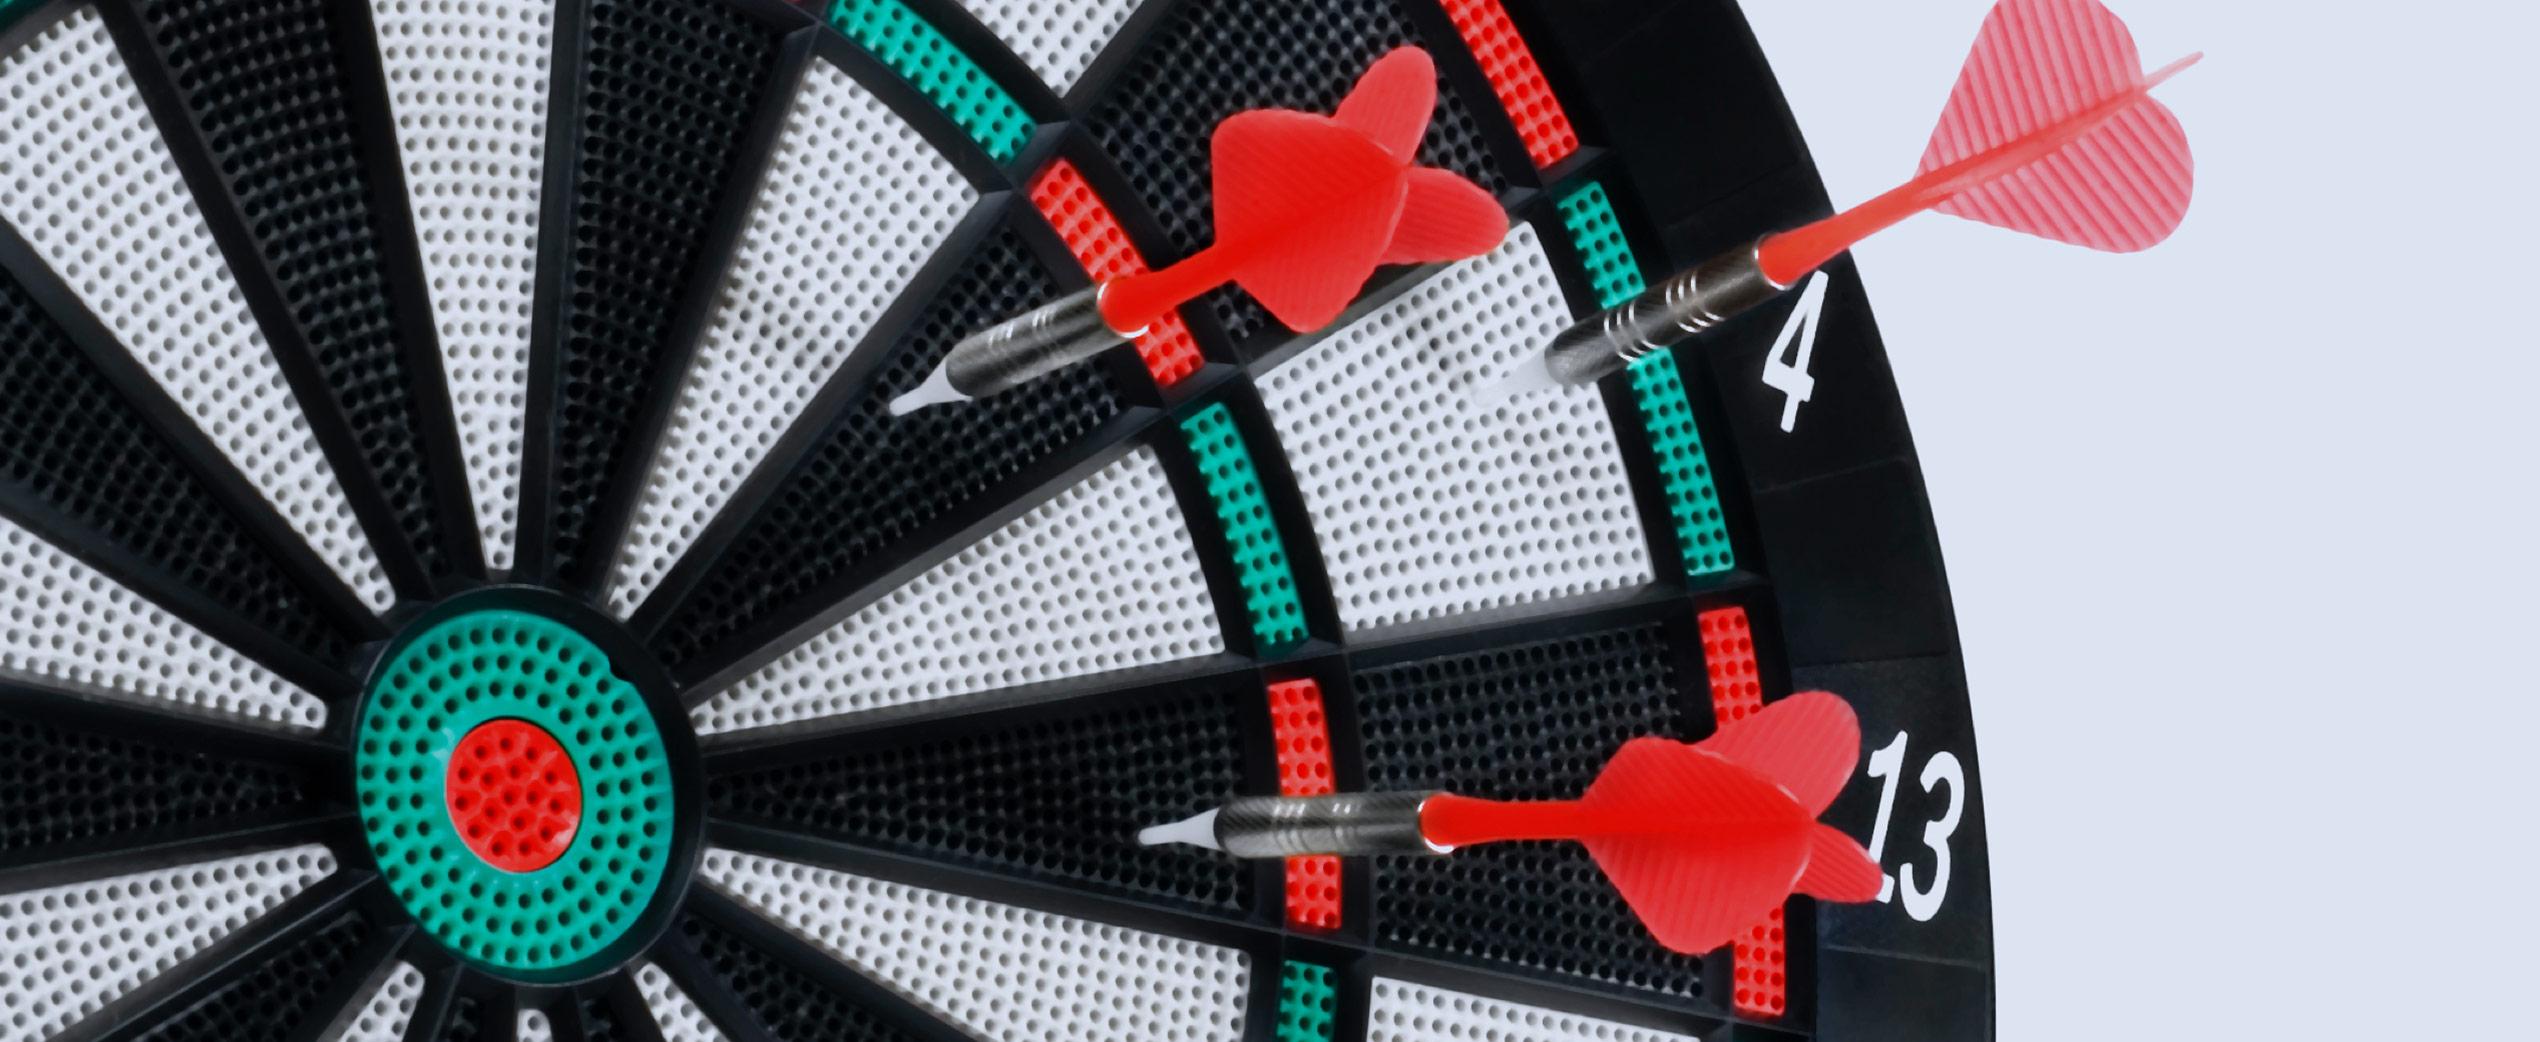 Dart board with darts away from the bullseye.